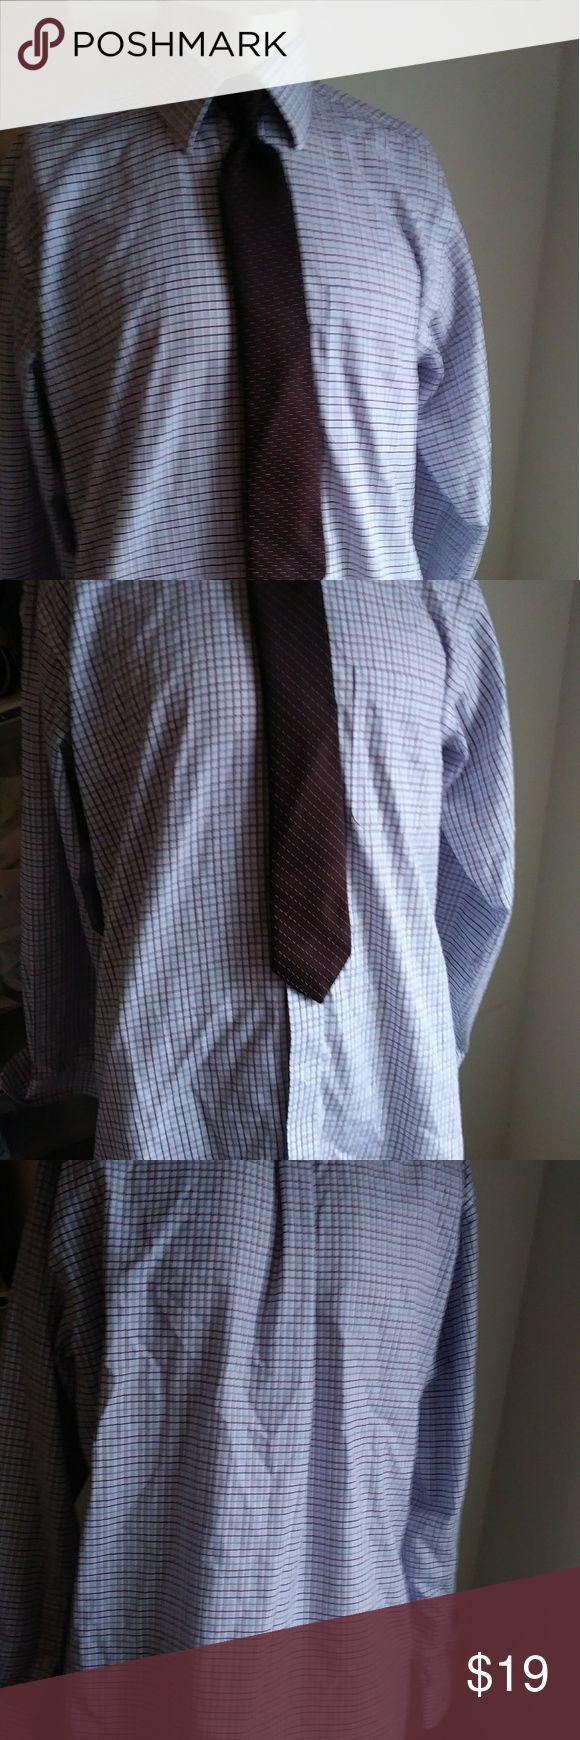 Kirkland non iron shirt Sz 16.5x35 $19 + free gift Kirkland non iron shirt Sz 16.5x35 $19 + free gift a complimentary silk designer necktie Plus any item in this closet price $15 or less. Kirkland no iron Shirts Dress Shirts